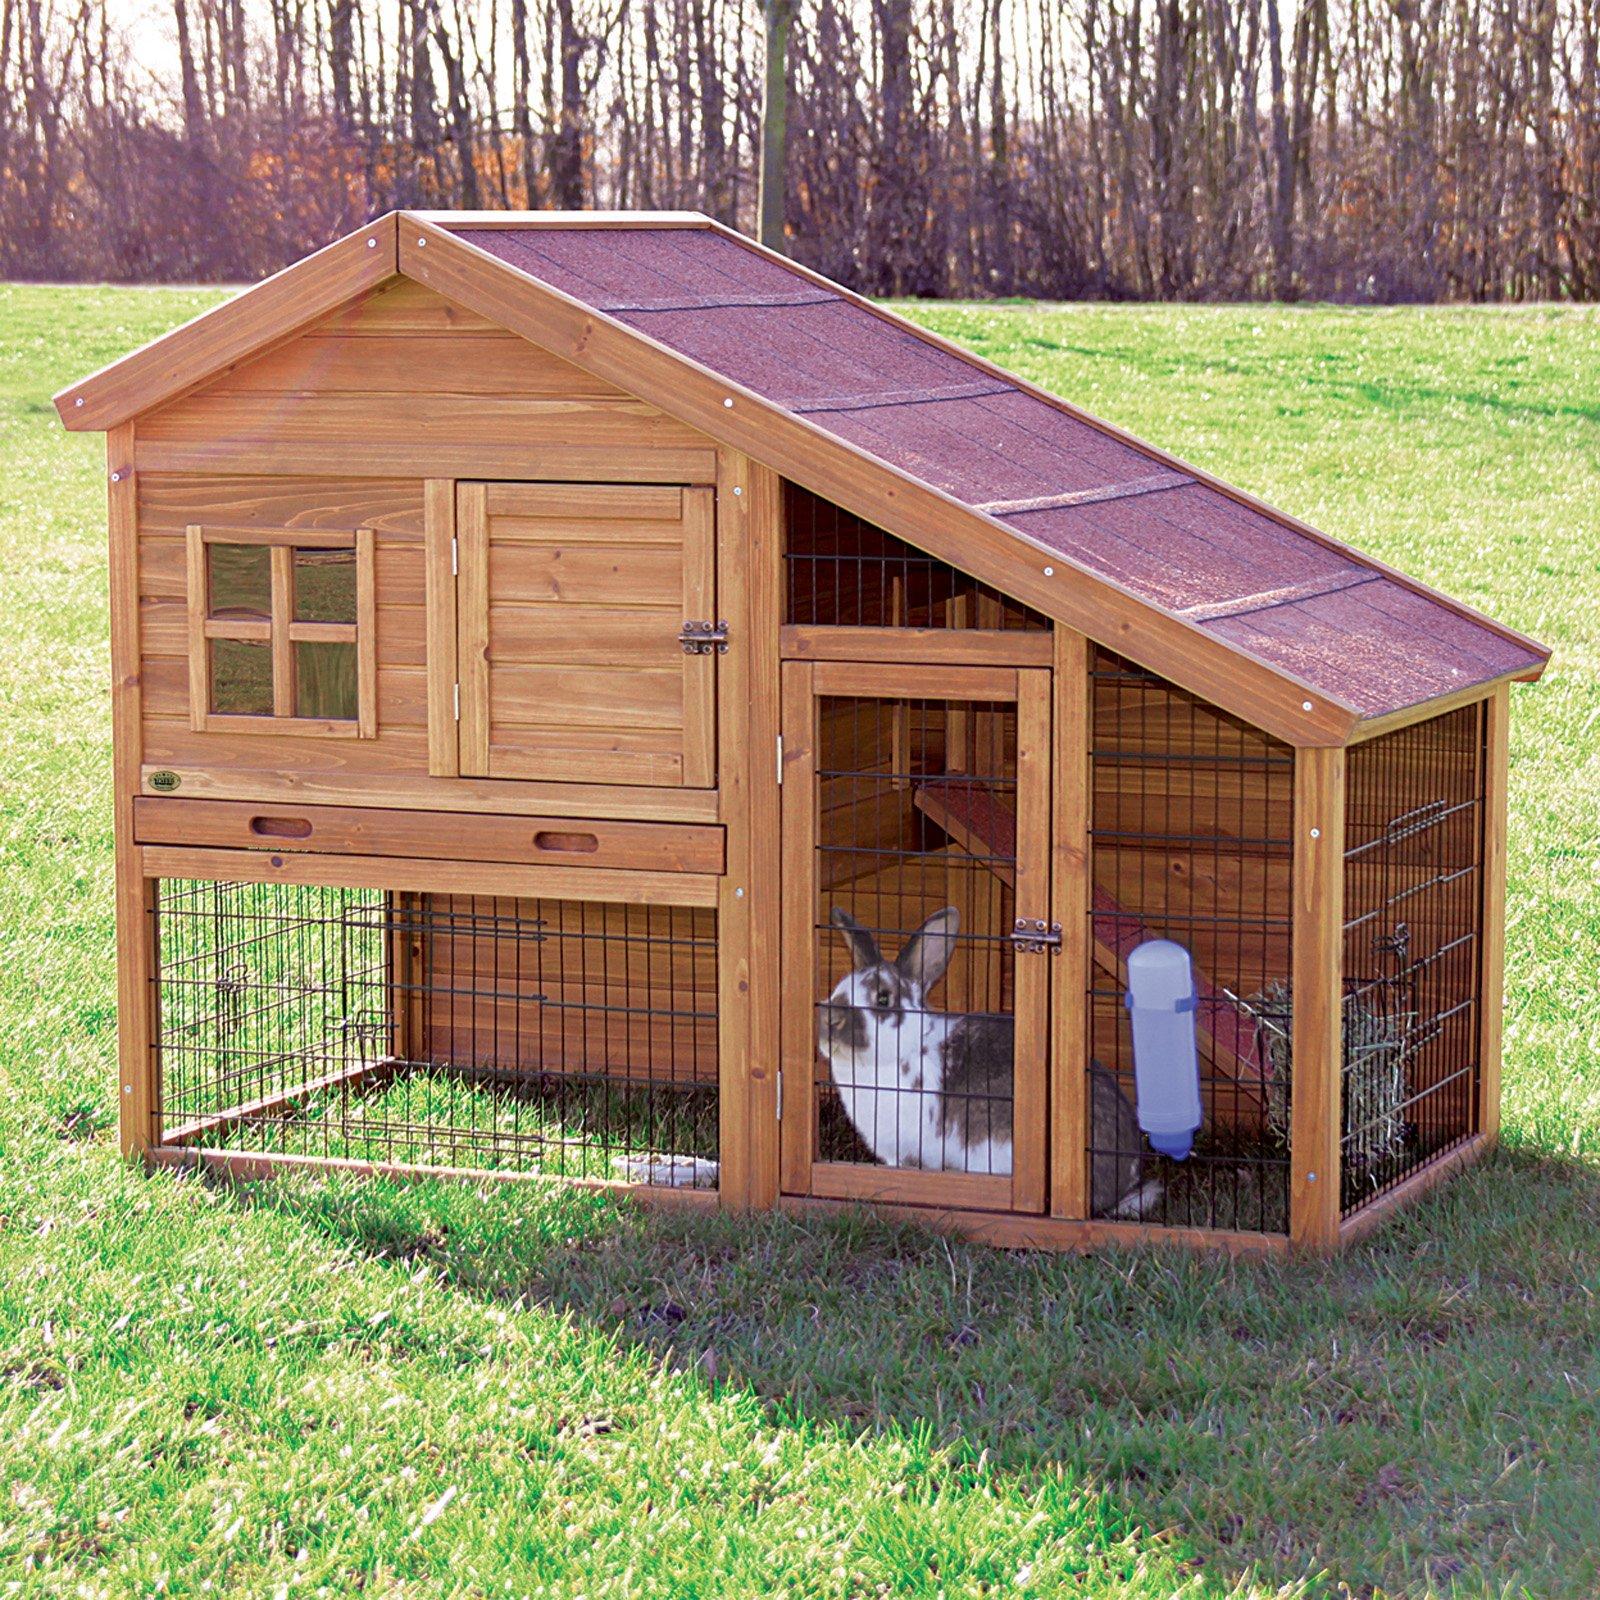 hd animals outdoor rabbit cages. Black Bedroom Furniture Sets. Home Design Ideas